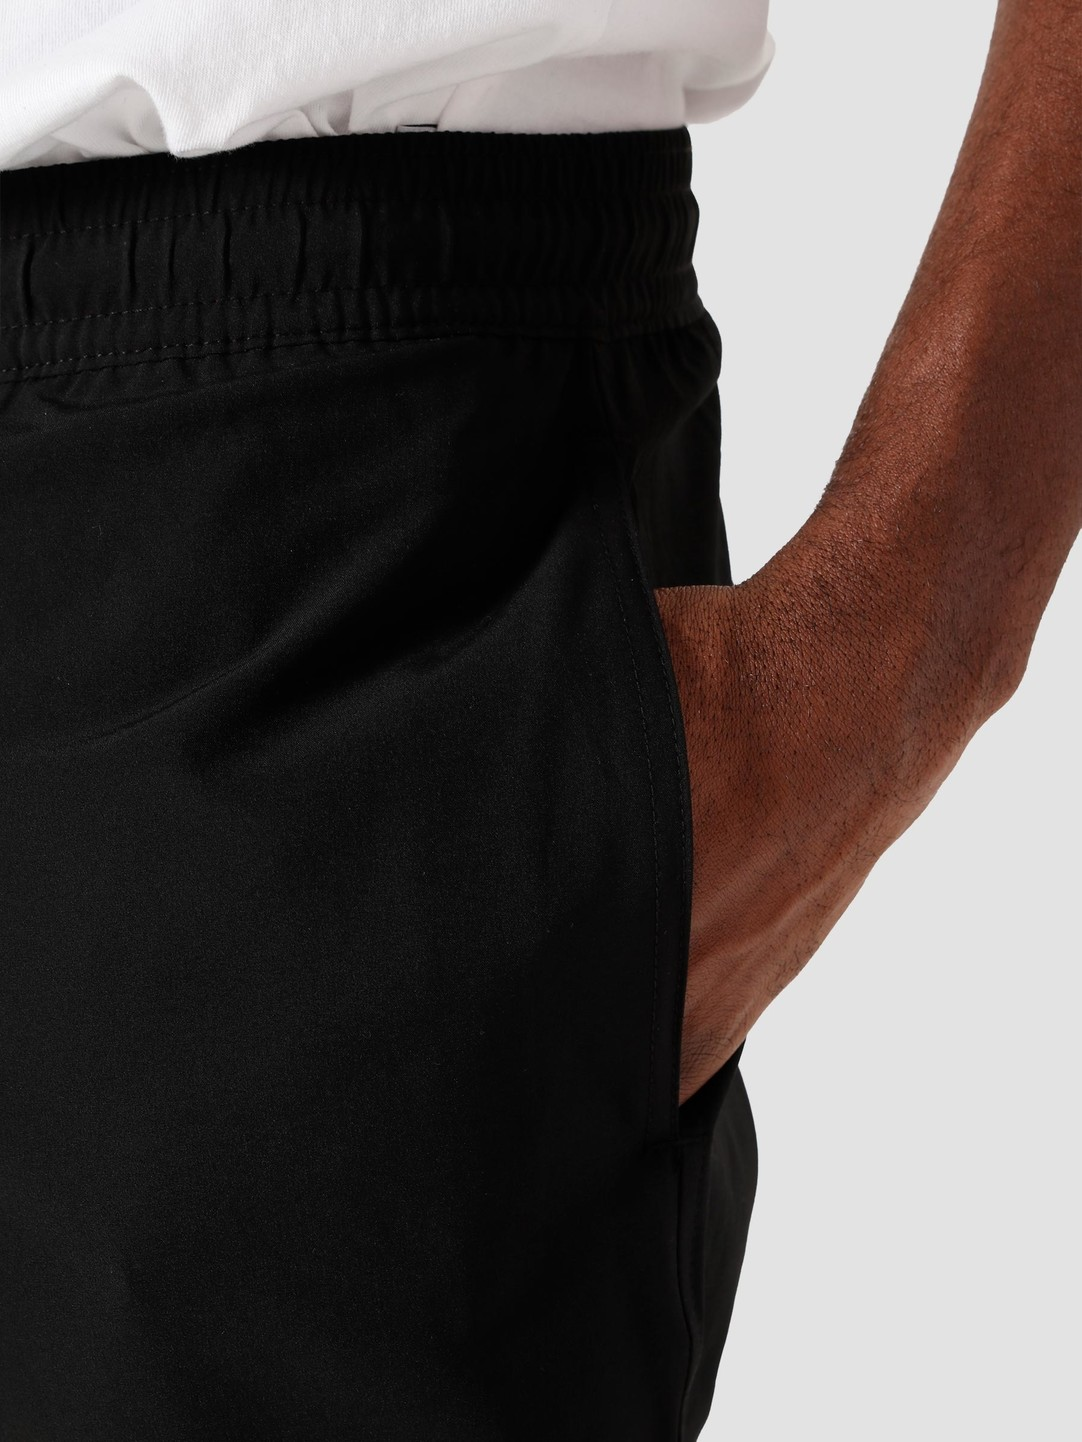 Polo Ralph Lauren Polo Ralph Lauren Recycled Polyester Traveler Short Polo Black 710837404009